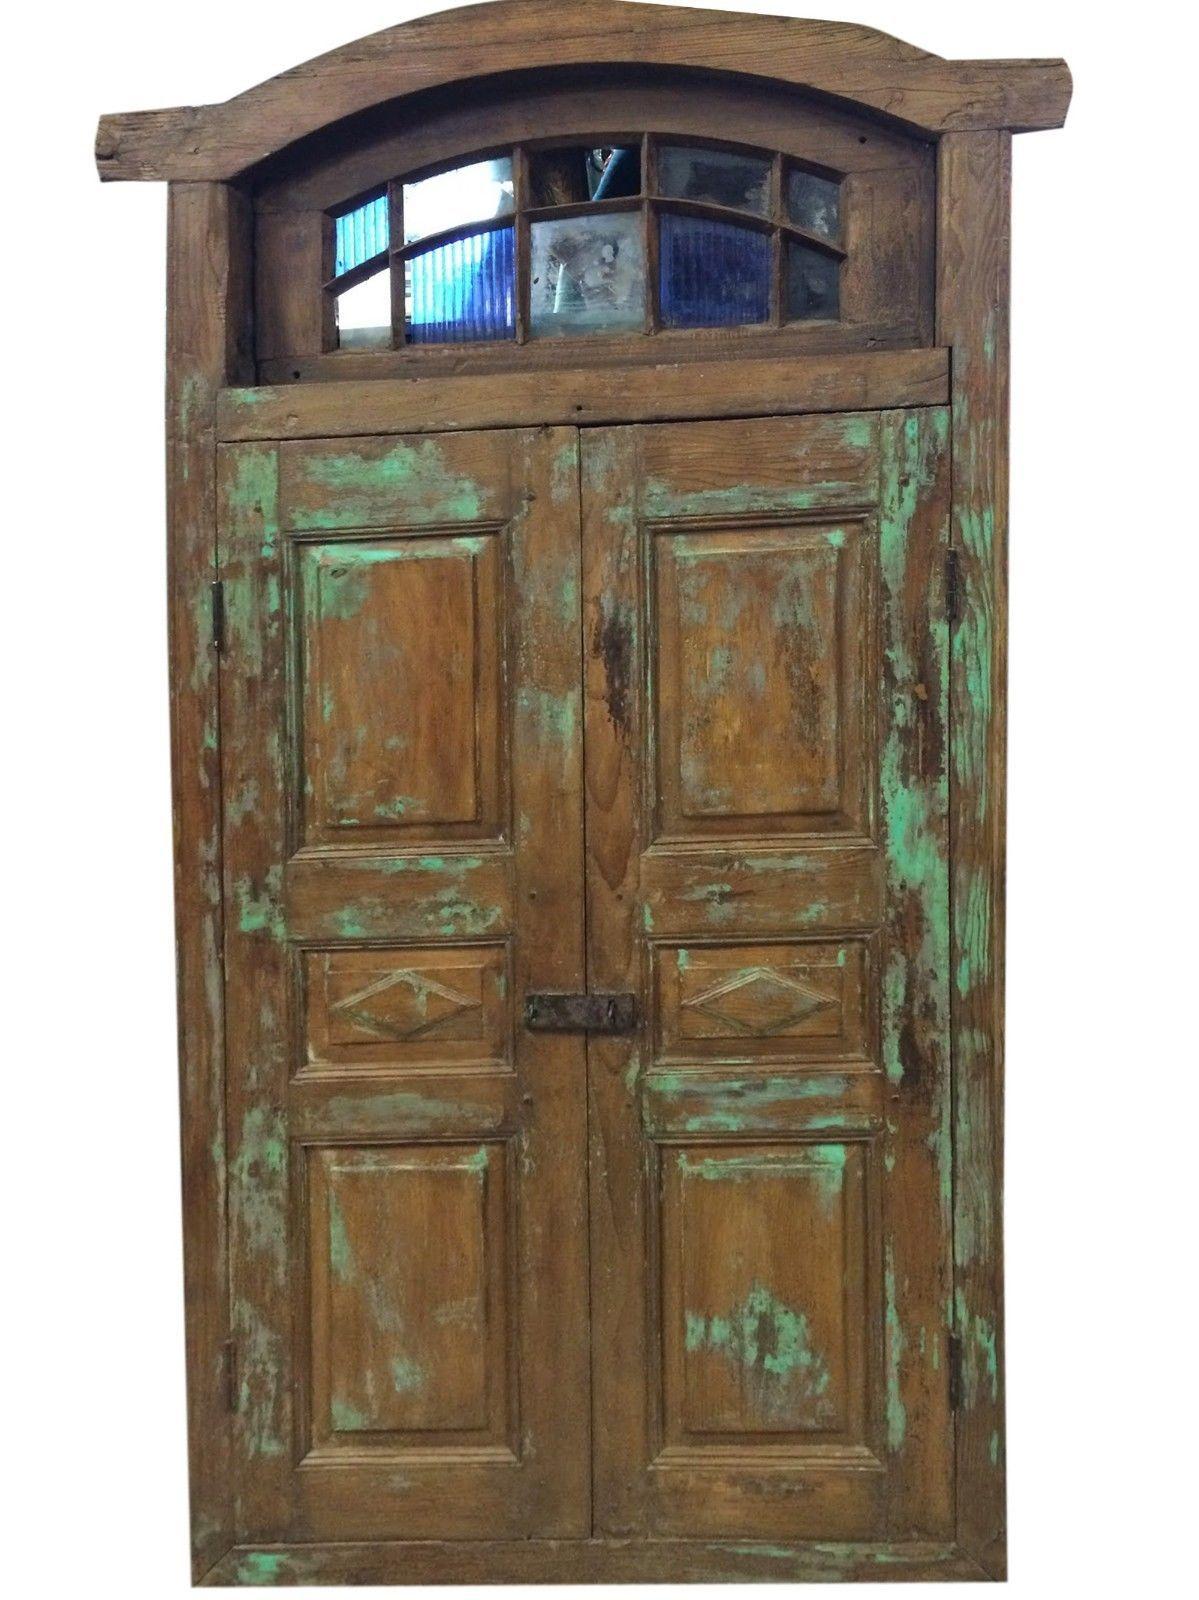 Antique Jaipur Door Vintage Rustic Terrace Window Architectural ...